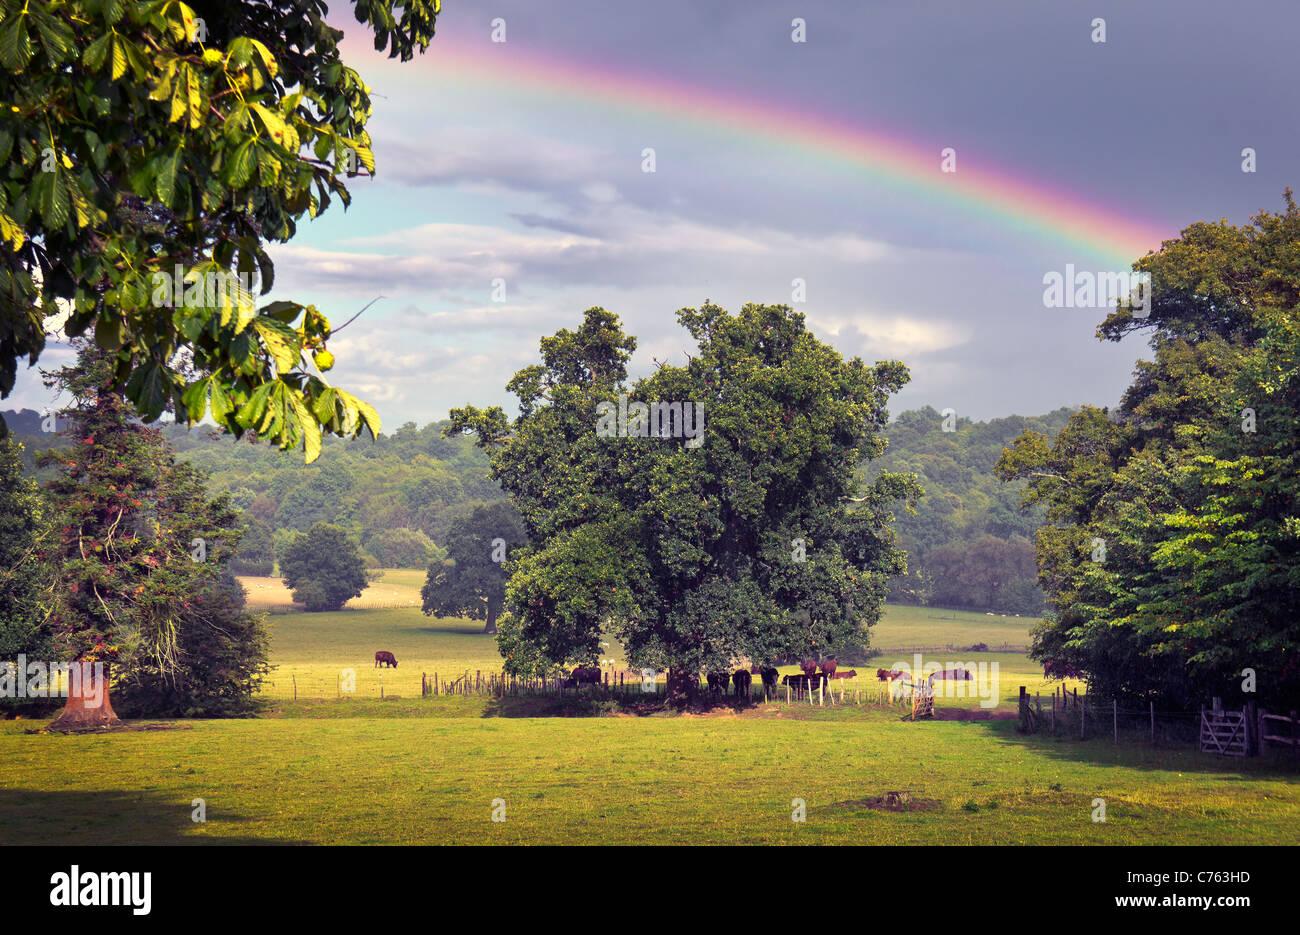 English countryside with rainbow - Stock Image